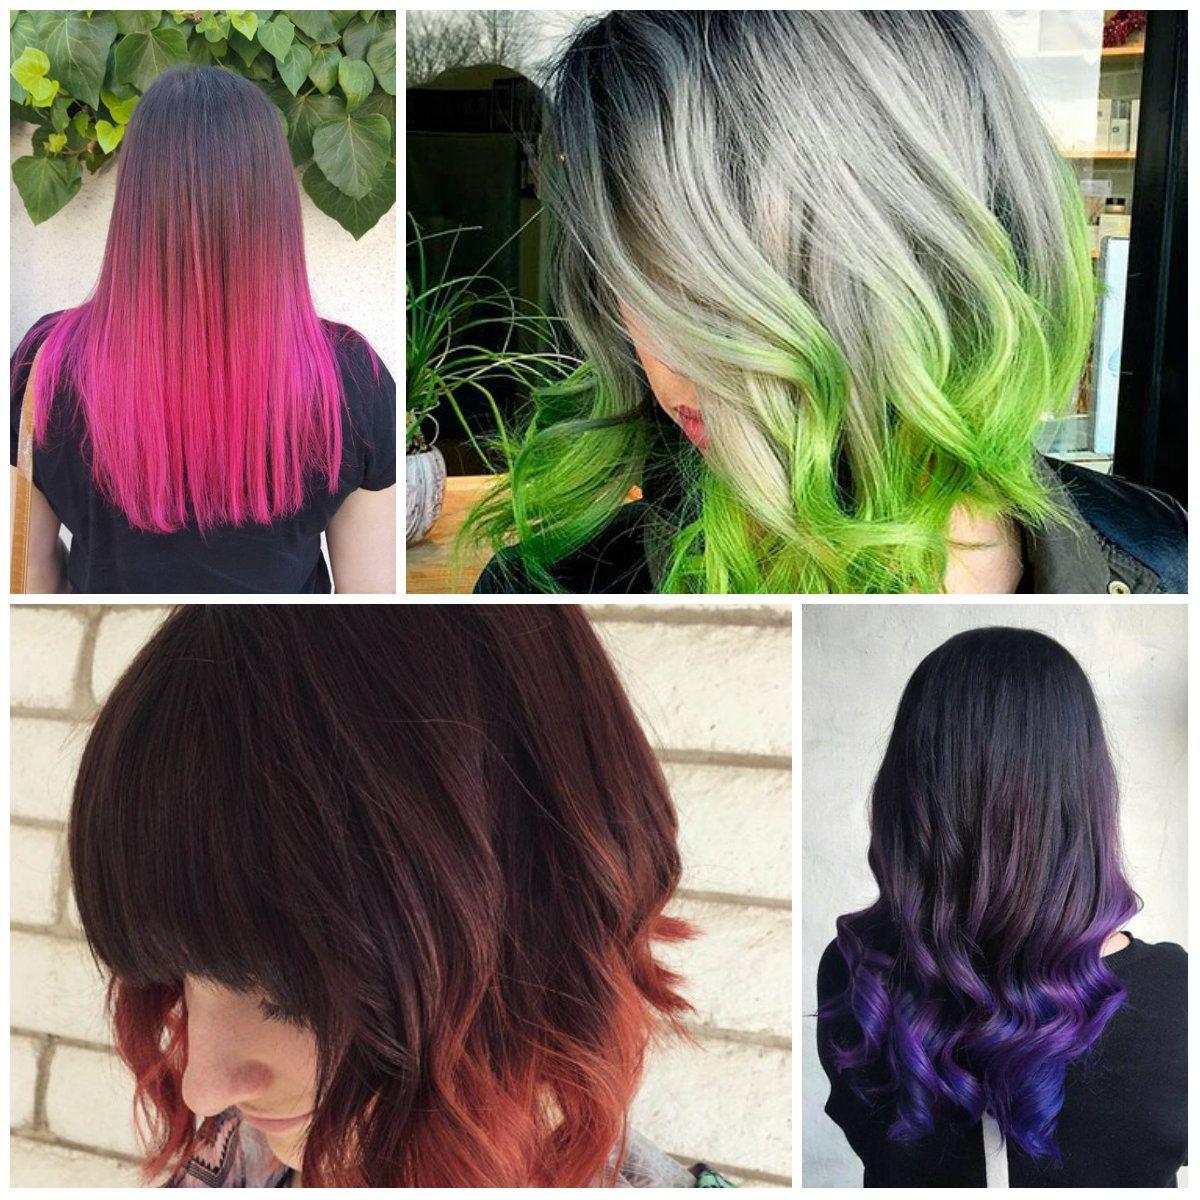 Top 10 Dip Dye Hair Color Ideas For